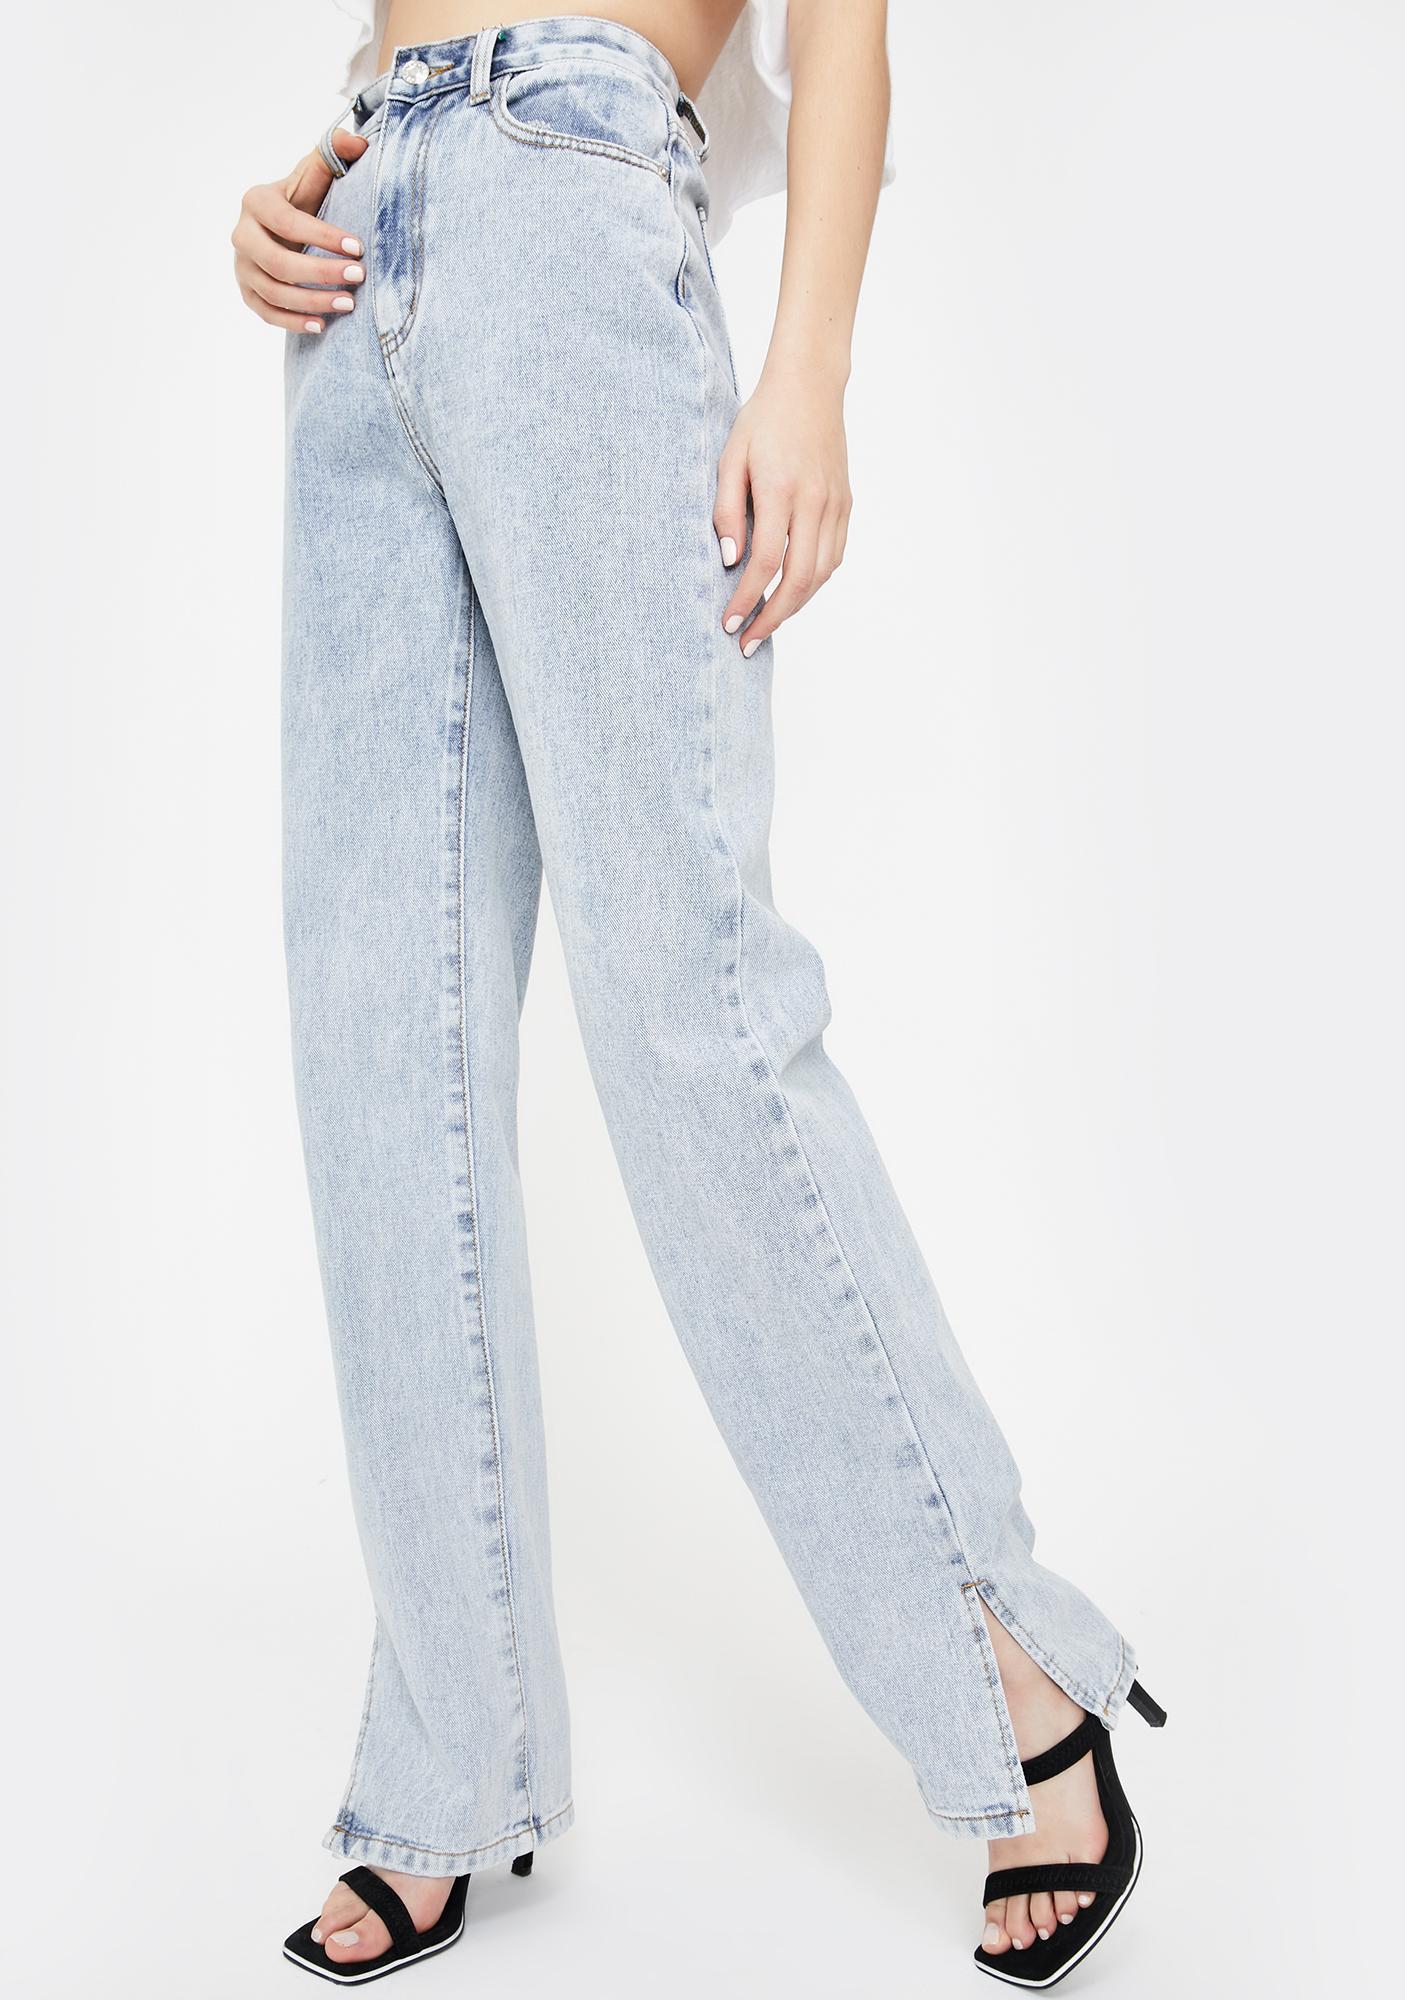 Momokrom Side Slit Hem Bleach Wash Jeans